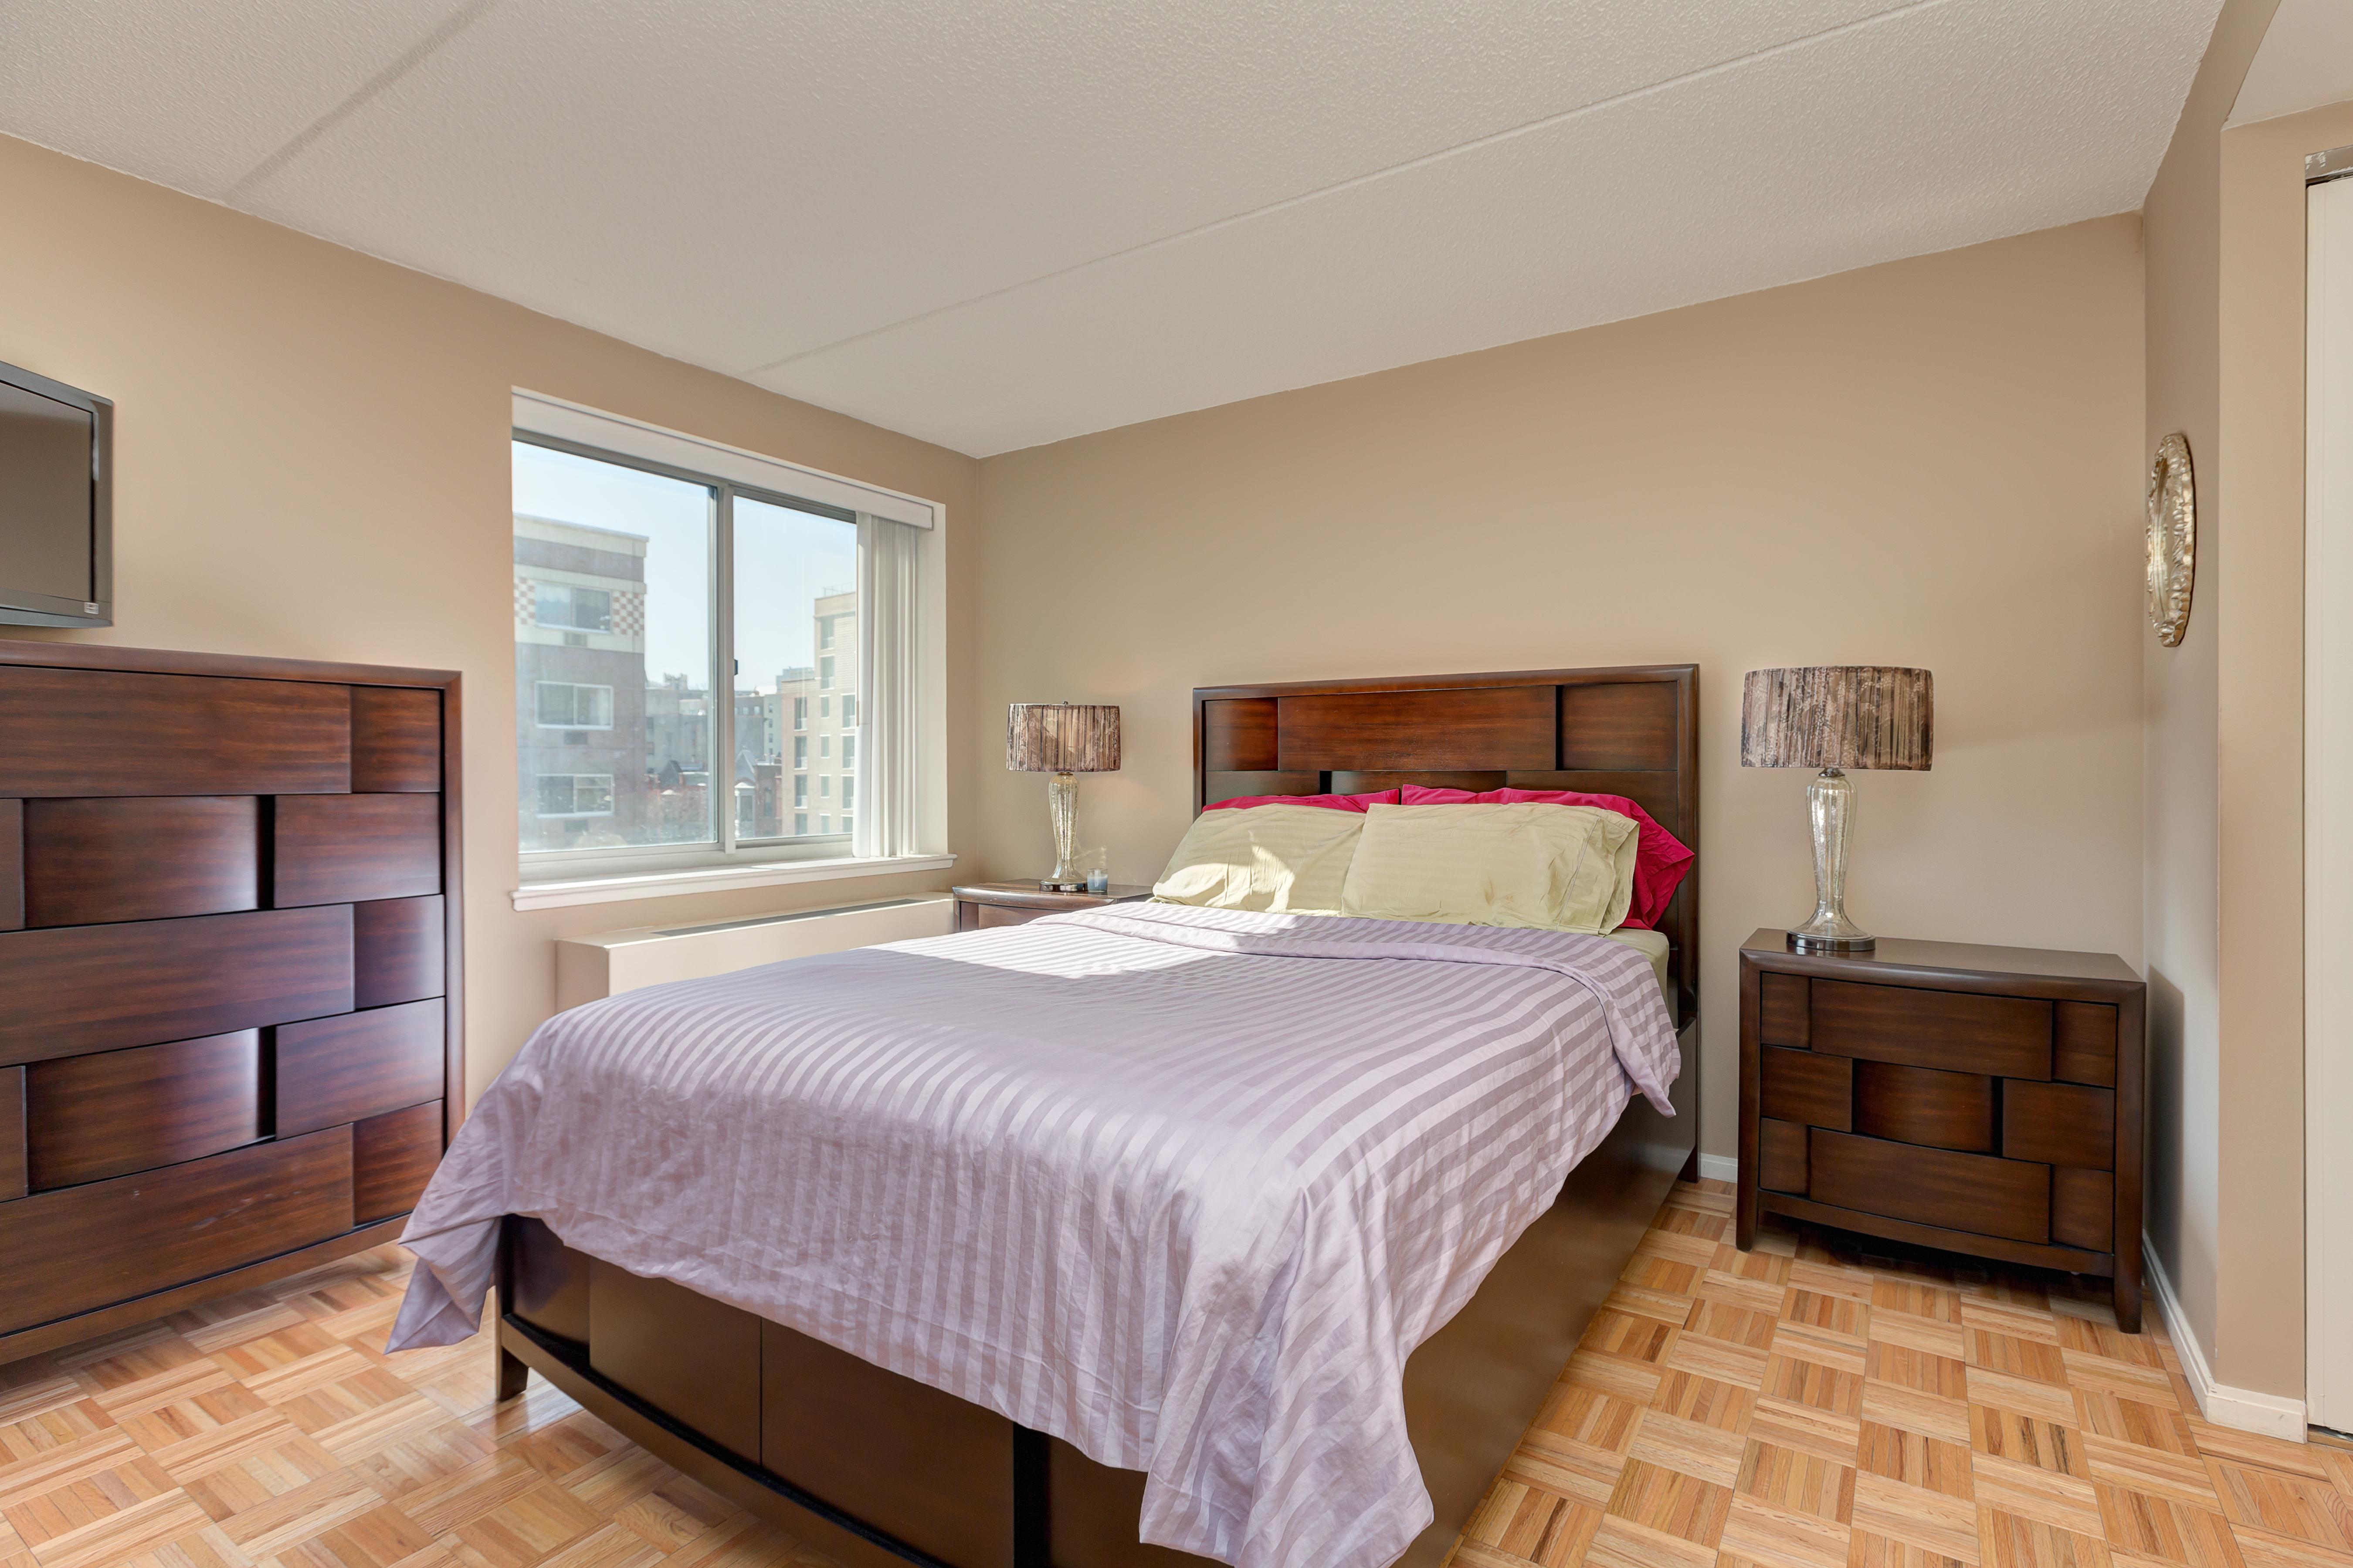 CORE - Patrick Lilly - 68 Bradhurst Ave - bedroom1